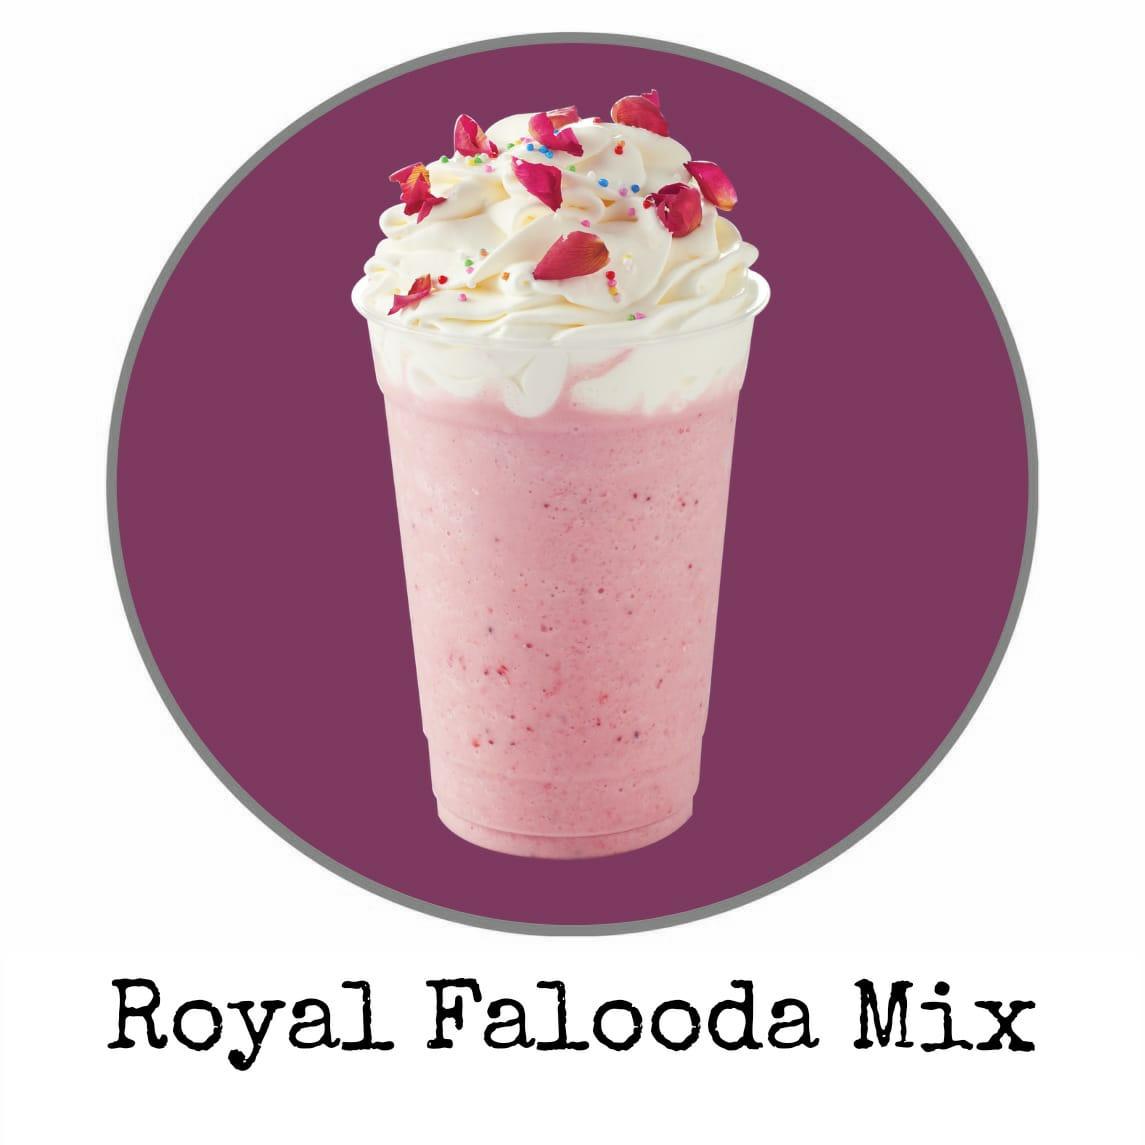 royal falooda